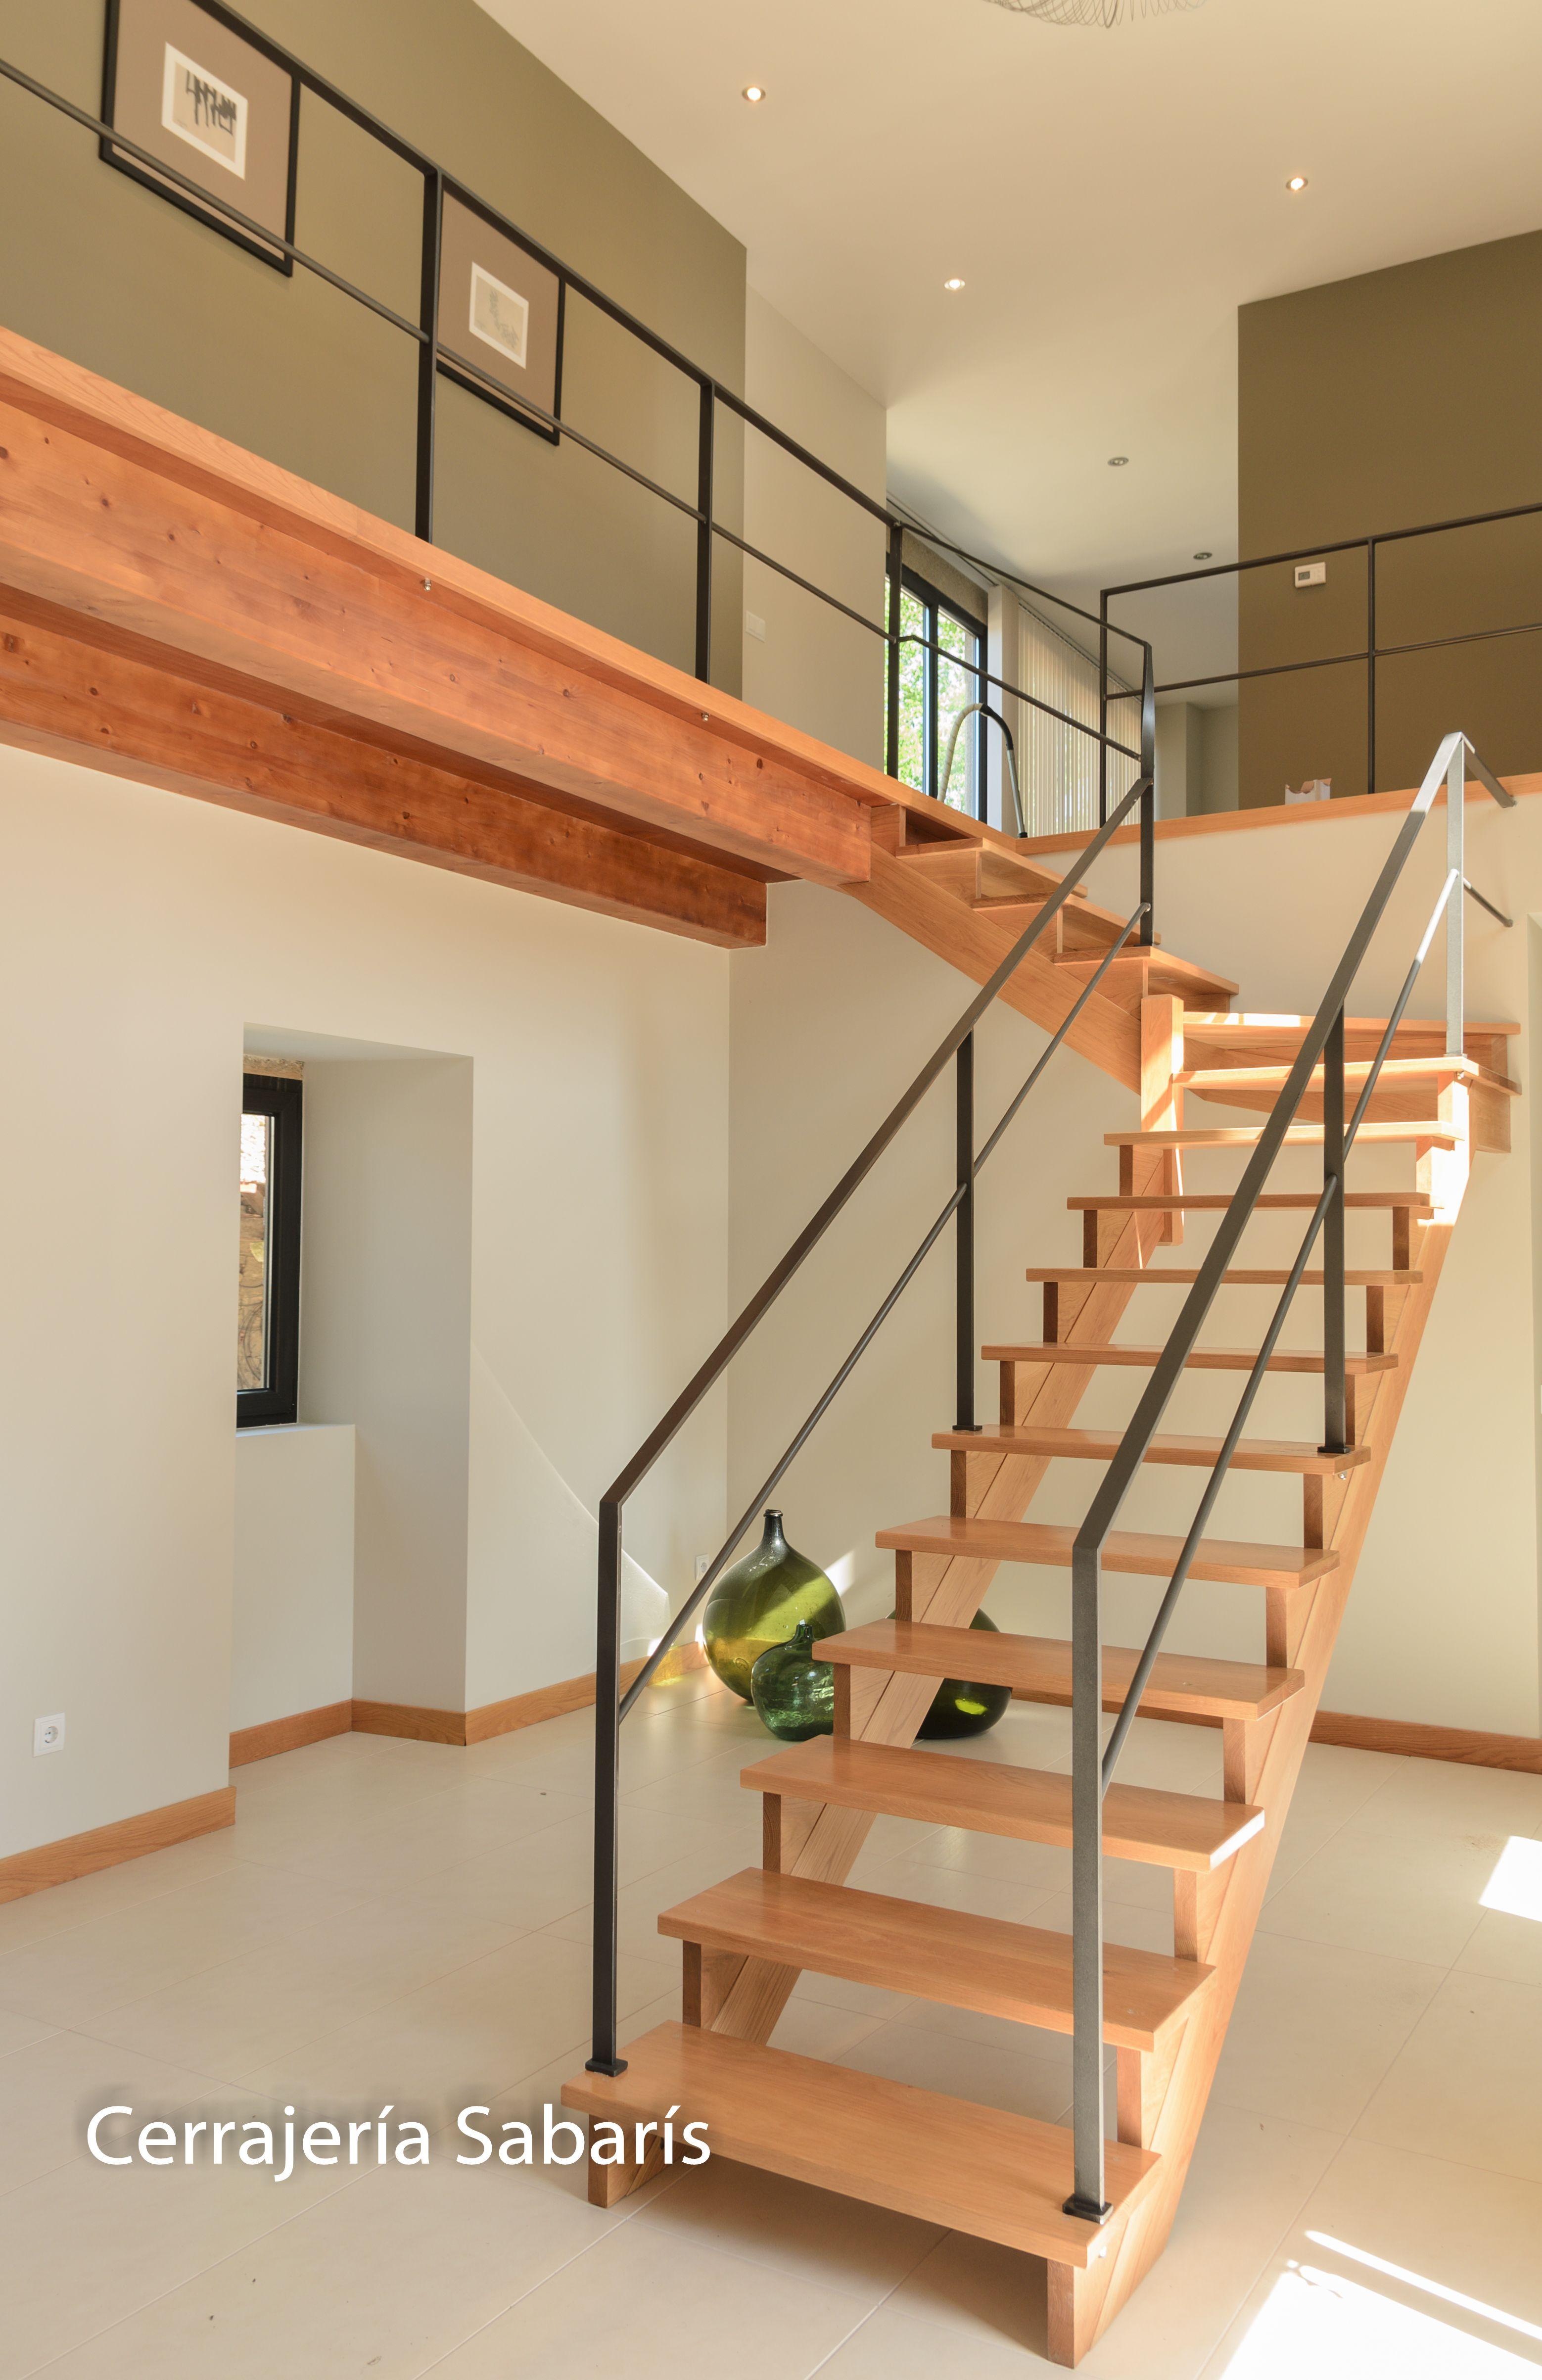 Barandilla para escalera de madera construida totalmente - Puertas para escaleras ...